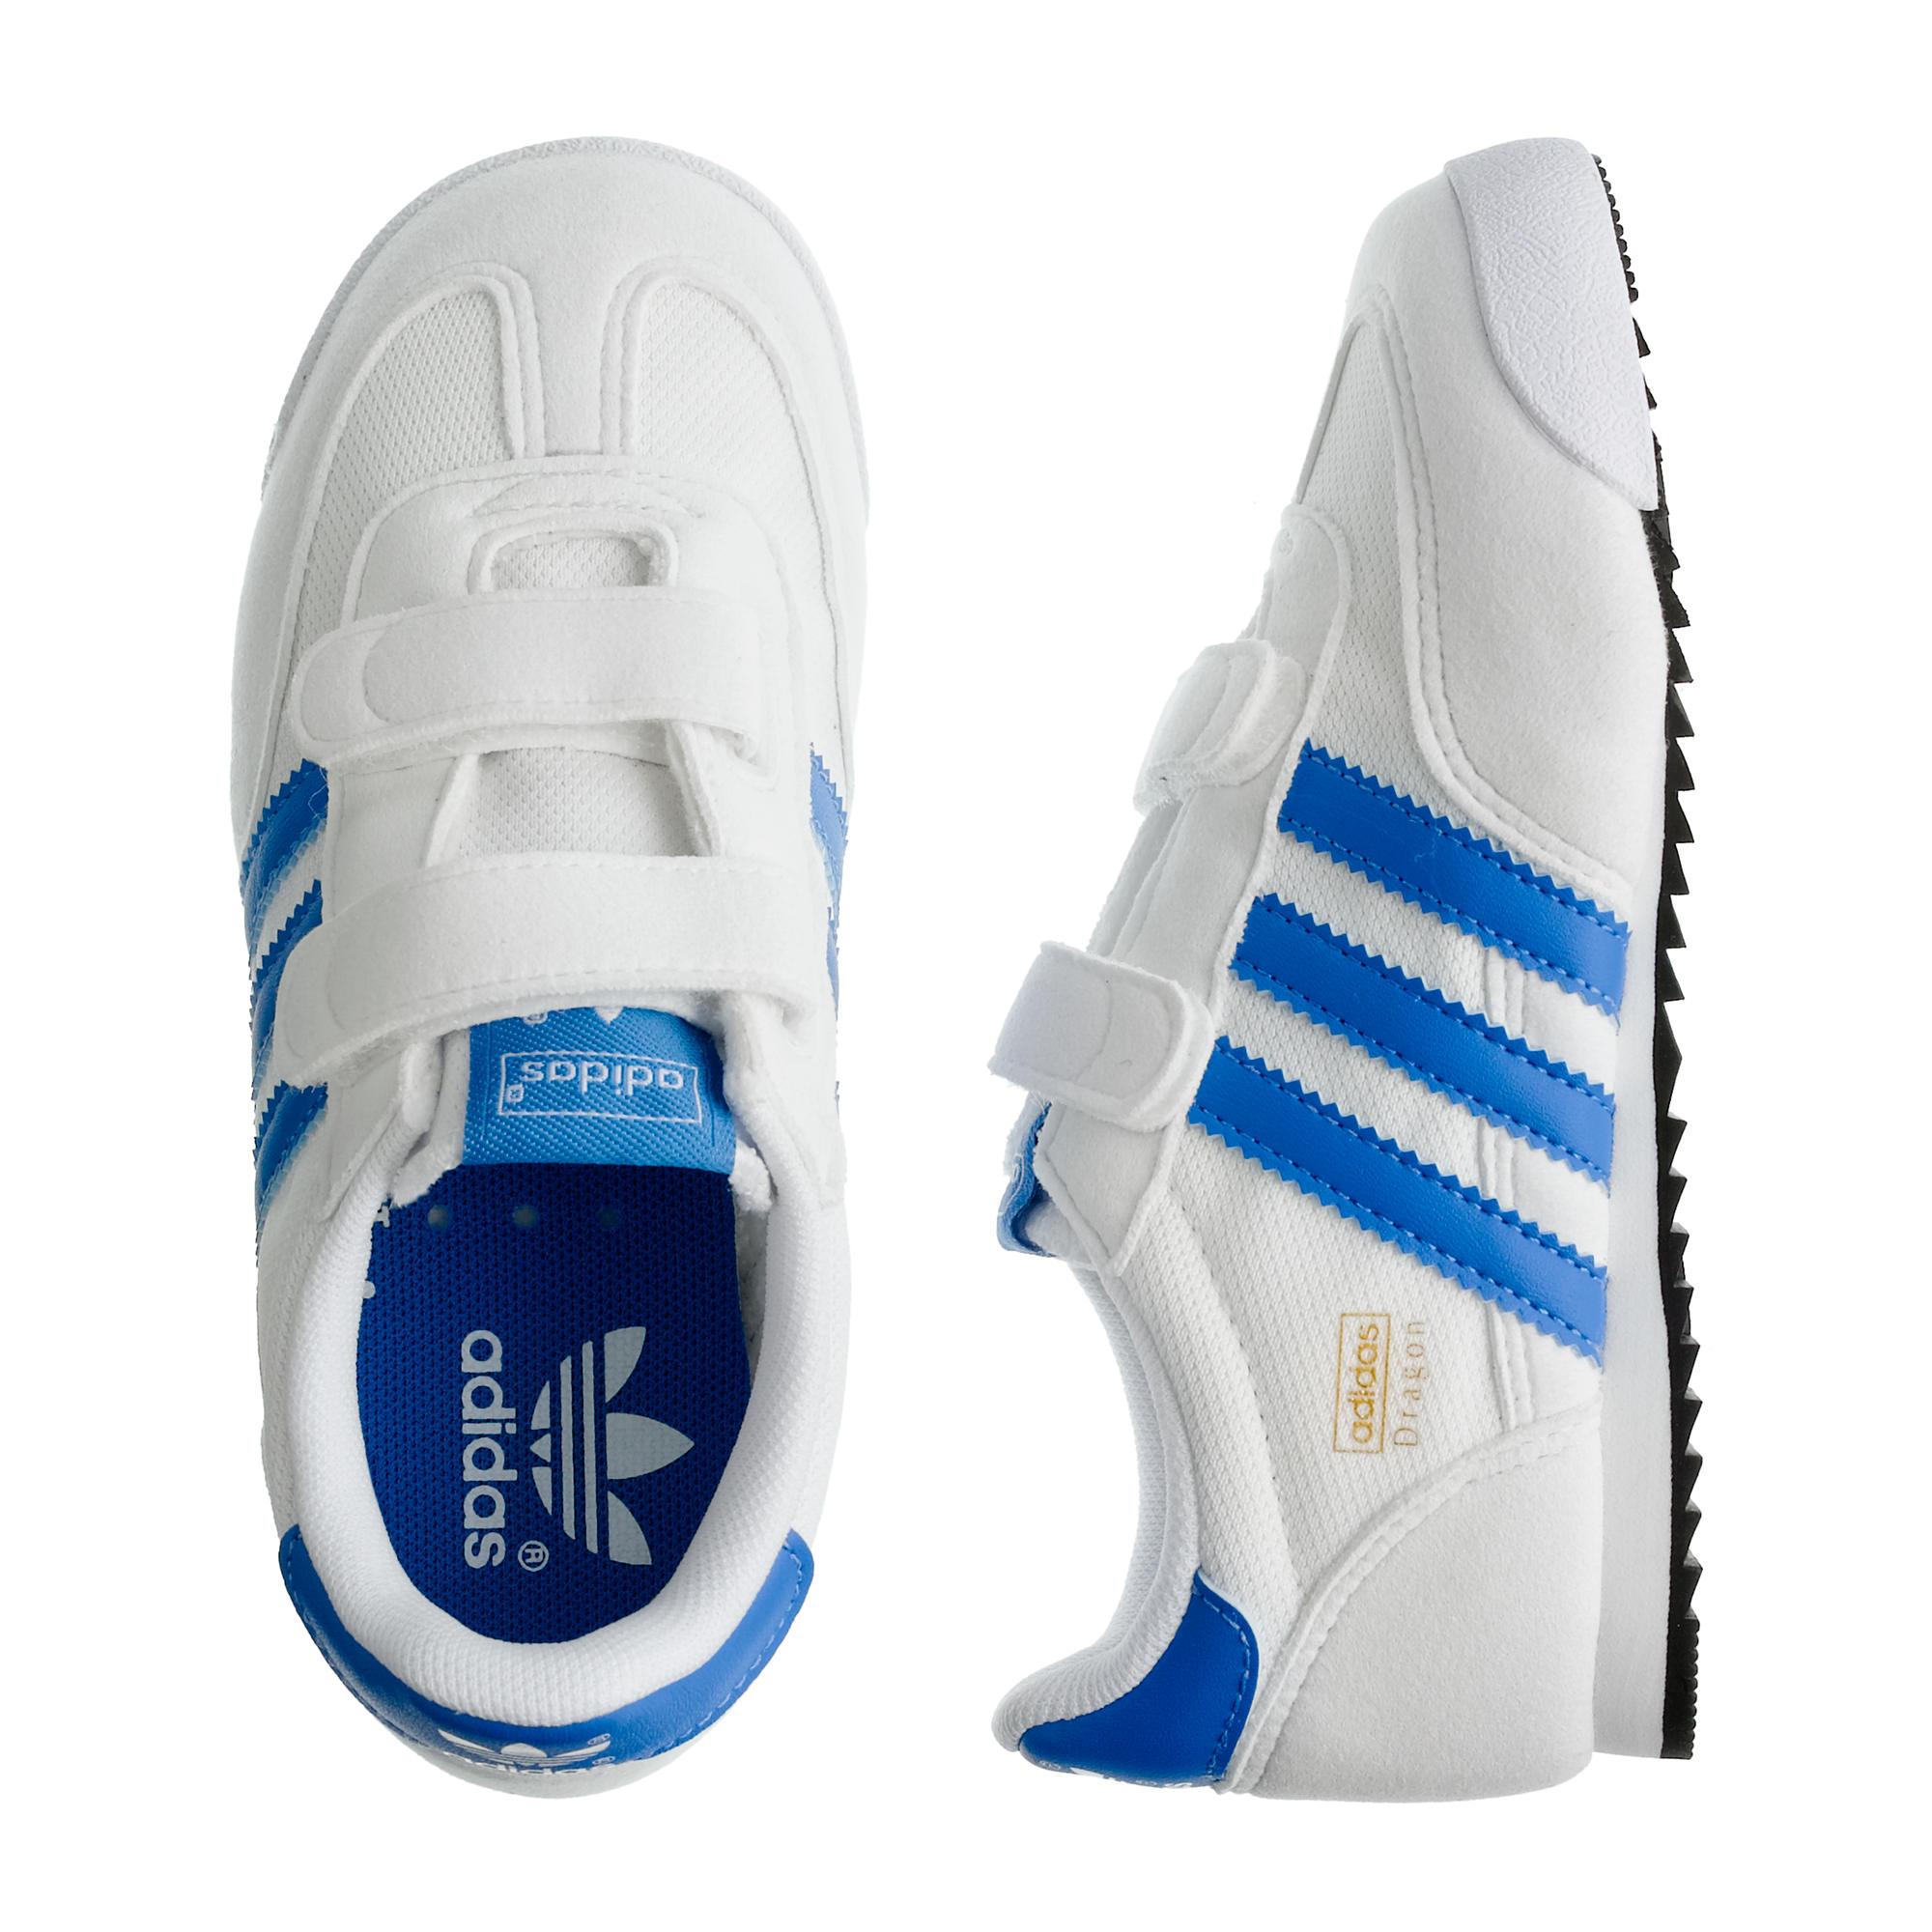 Adidas Dragon Shoes Velcro